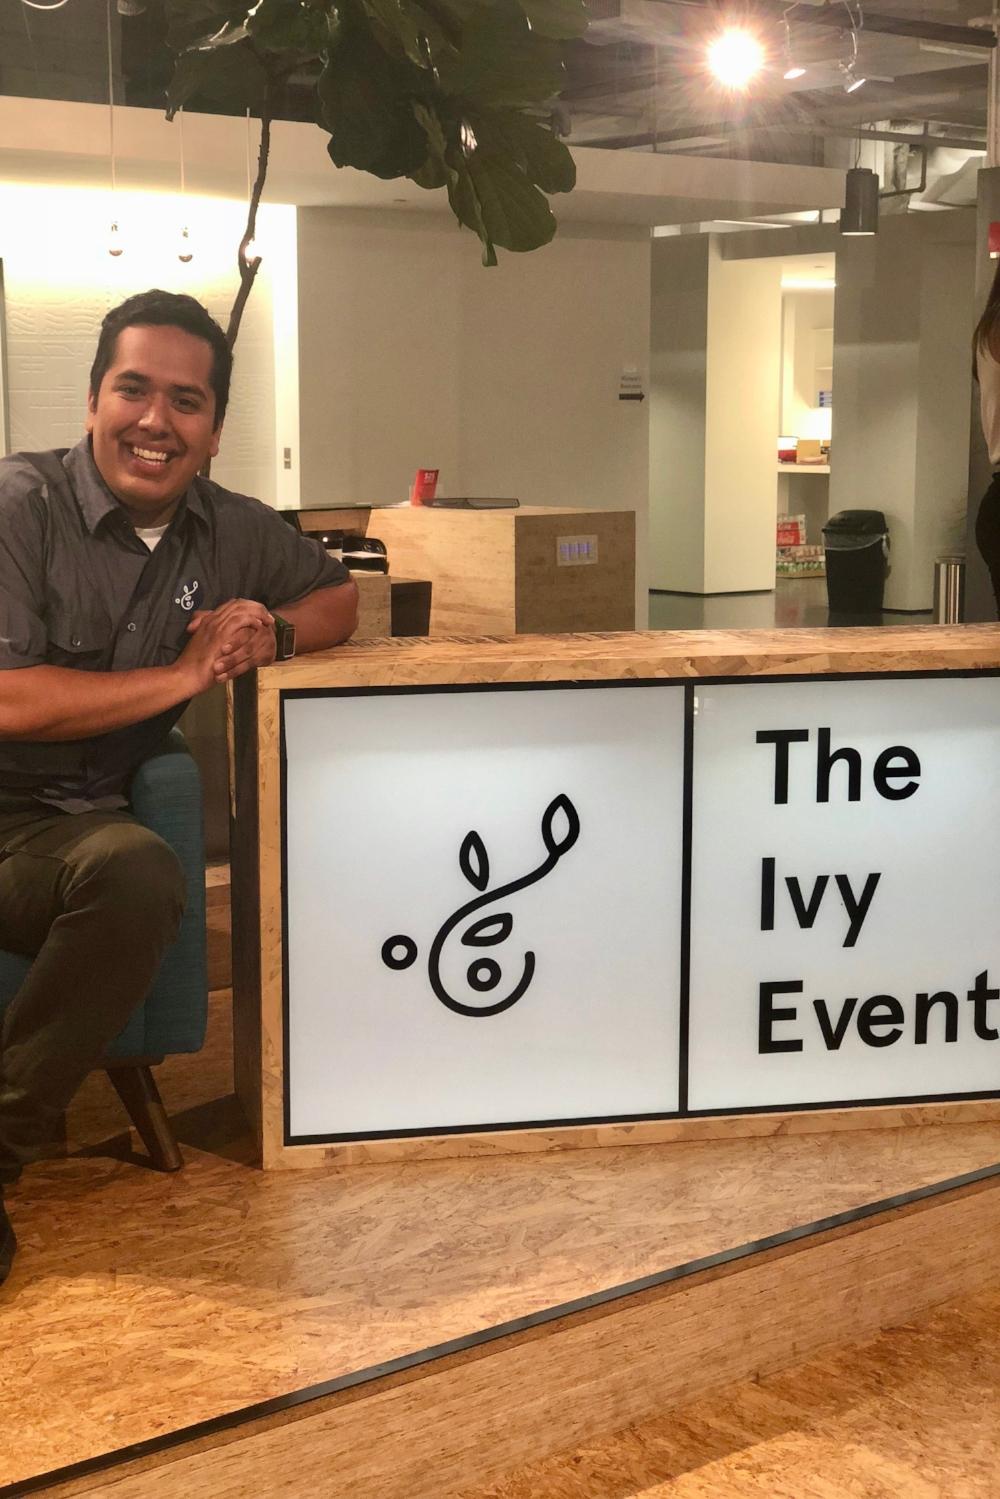 event ivyevent couples love  https://www.findingarizonapodcast.com/finding-az-engagement/